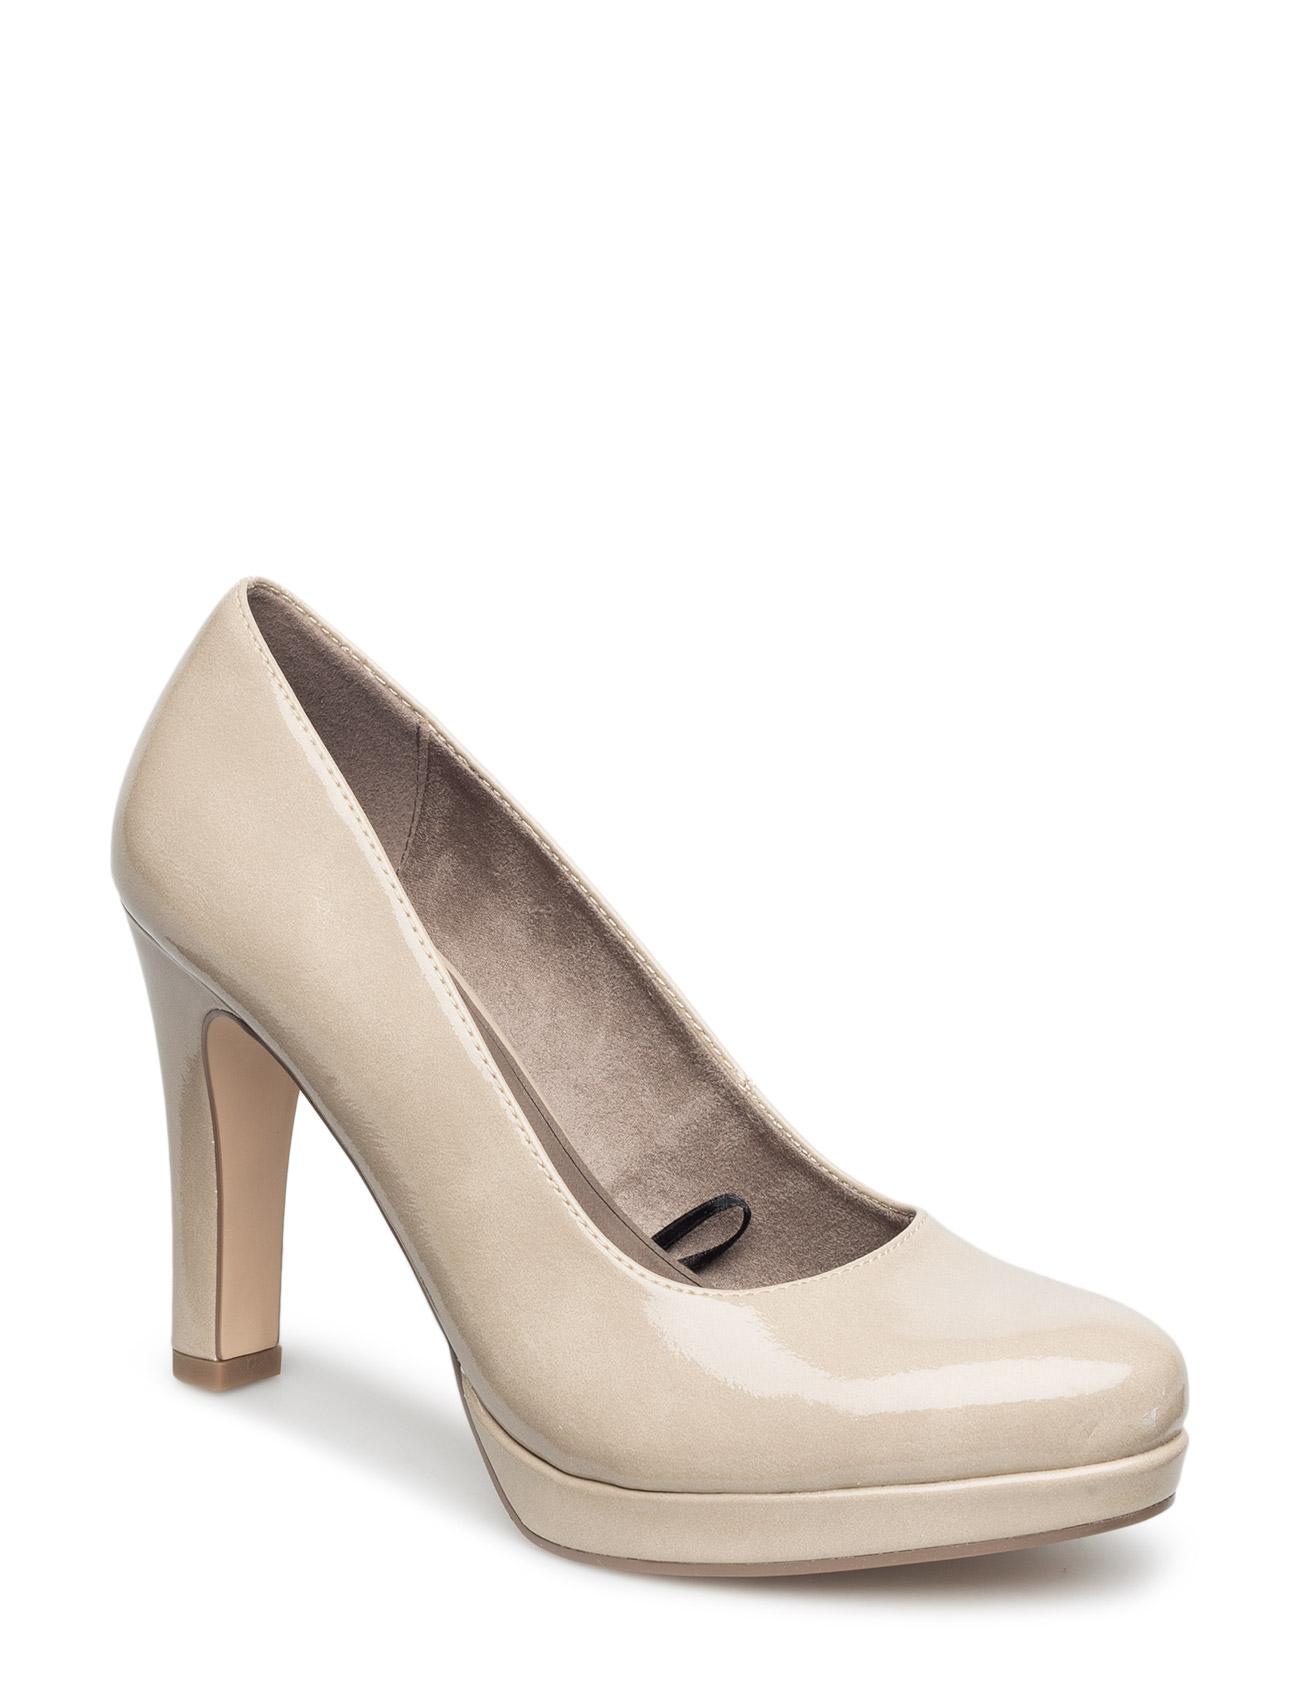 Woms Court Shoe Tamaris Stiletter til Kvinder i Cream patent